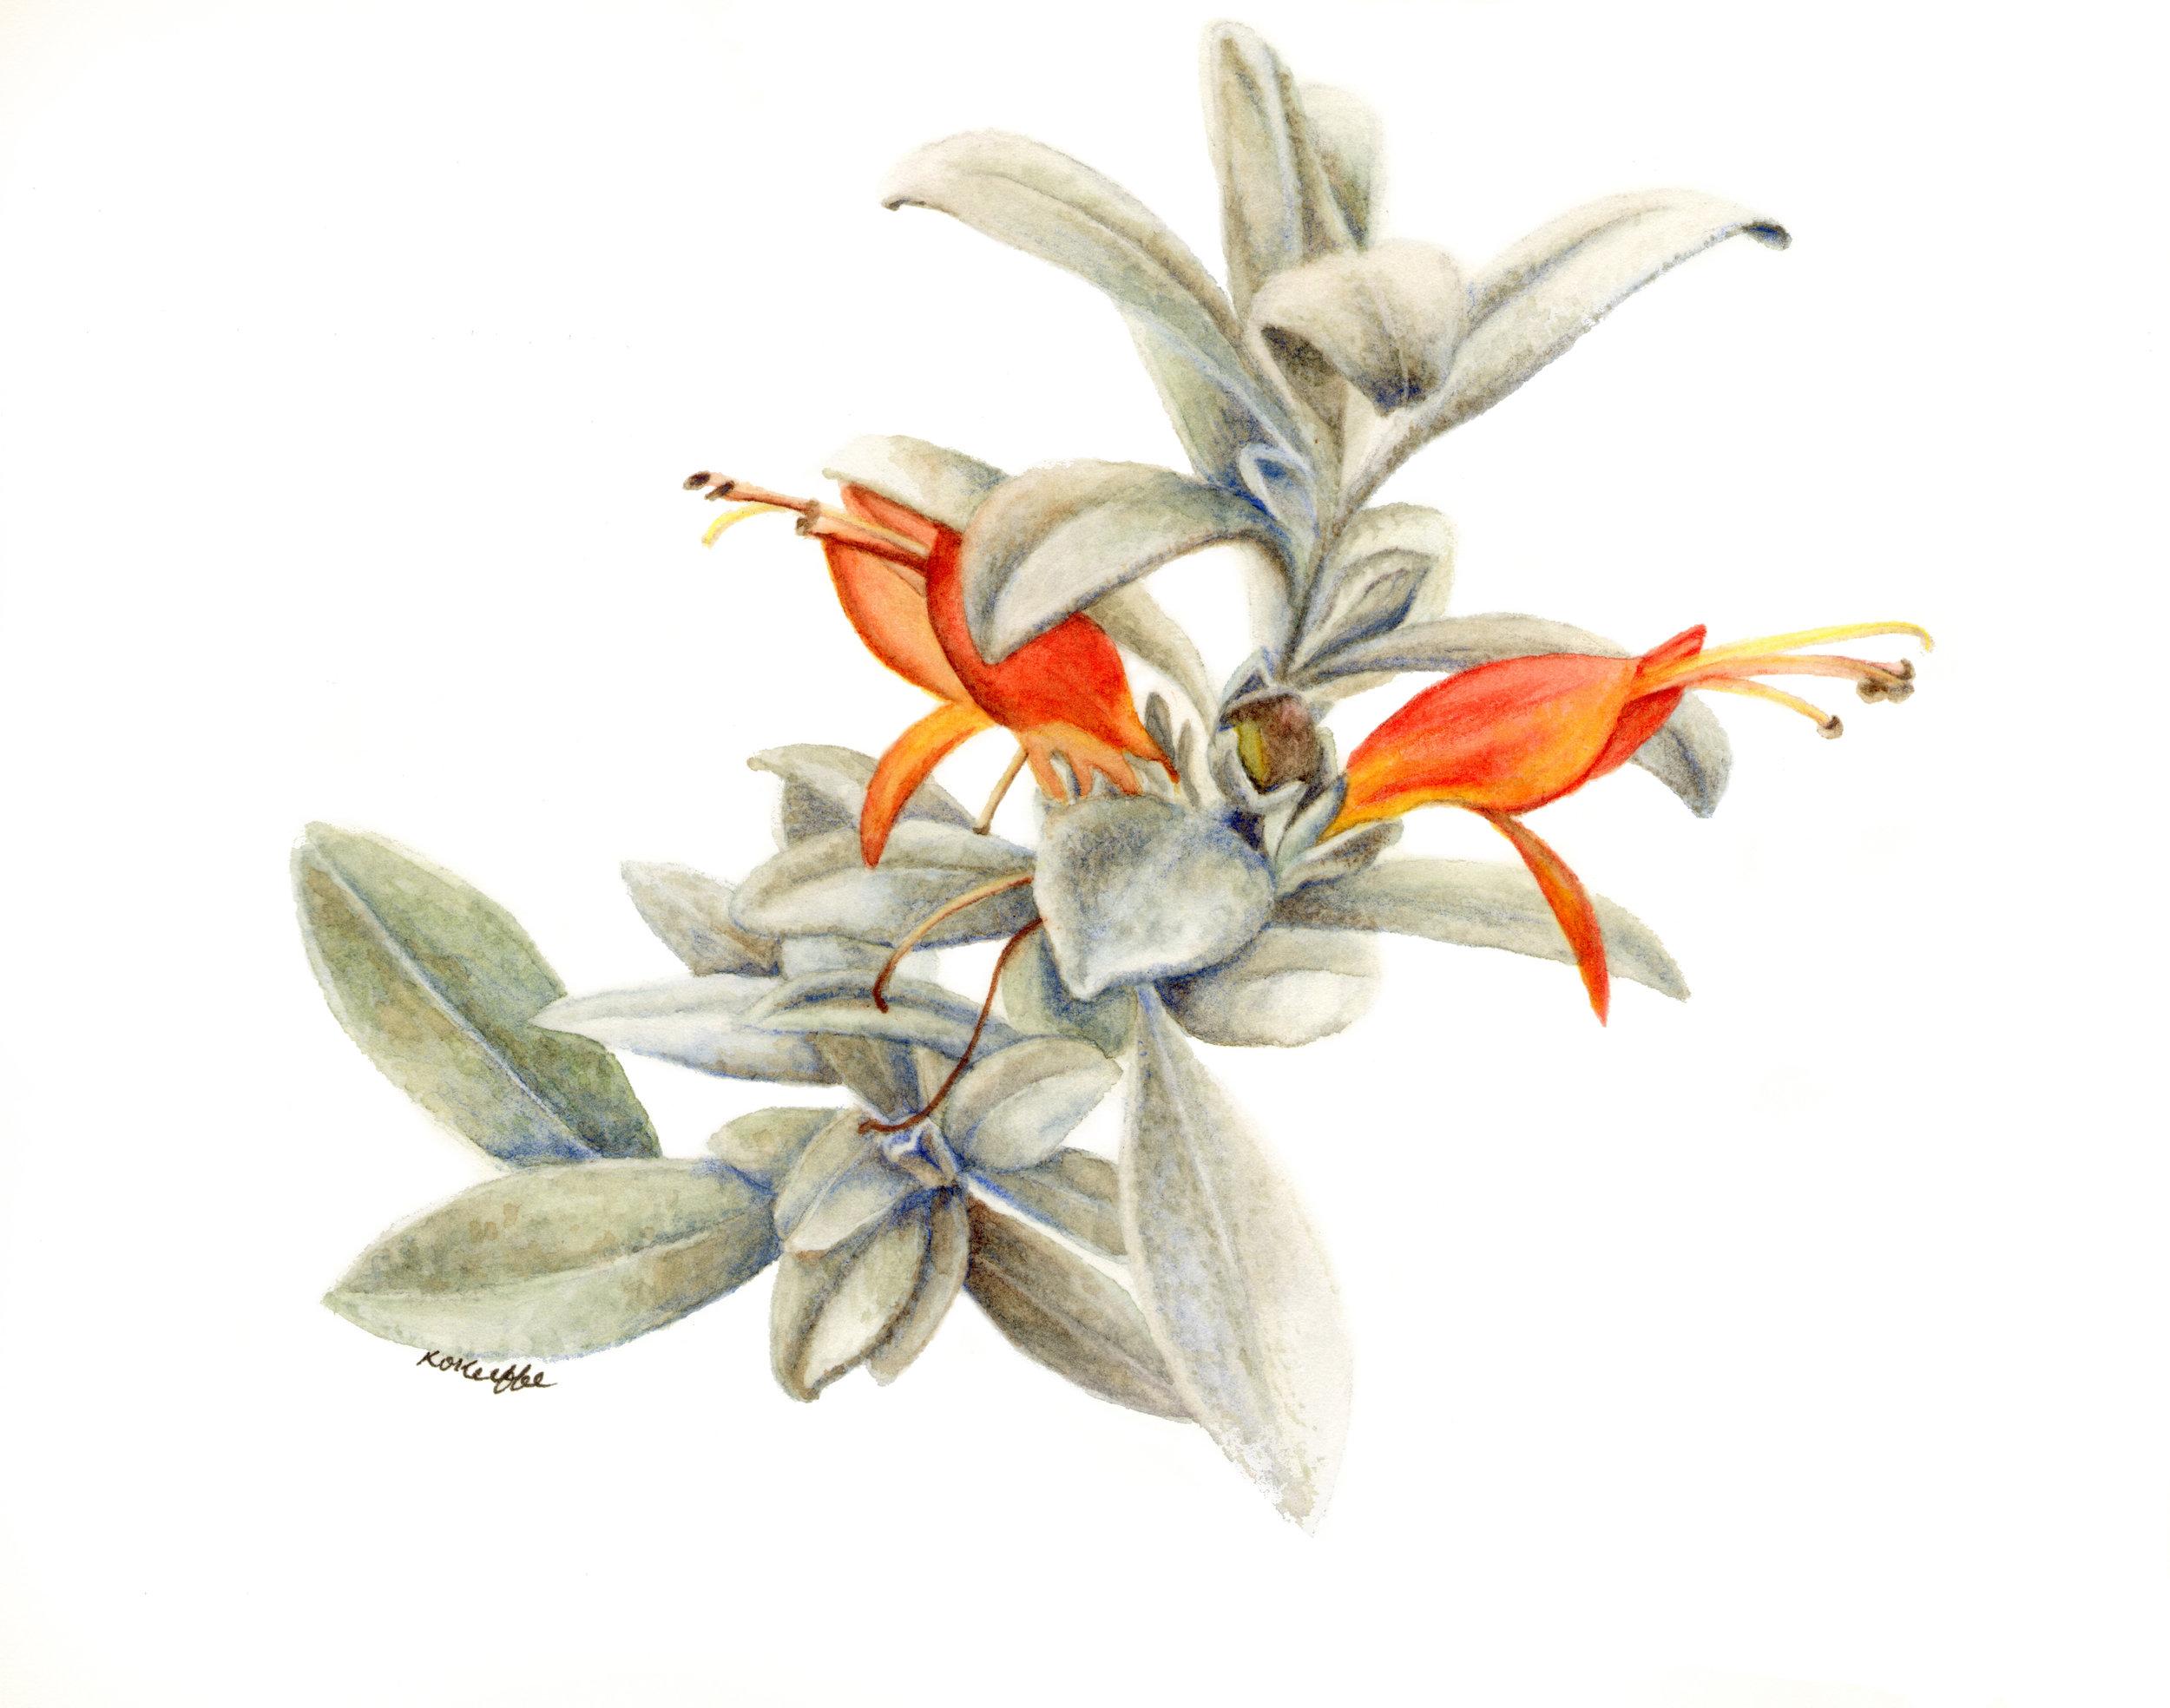 Eremophila glabra, Tar bush